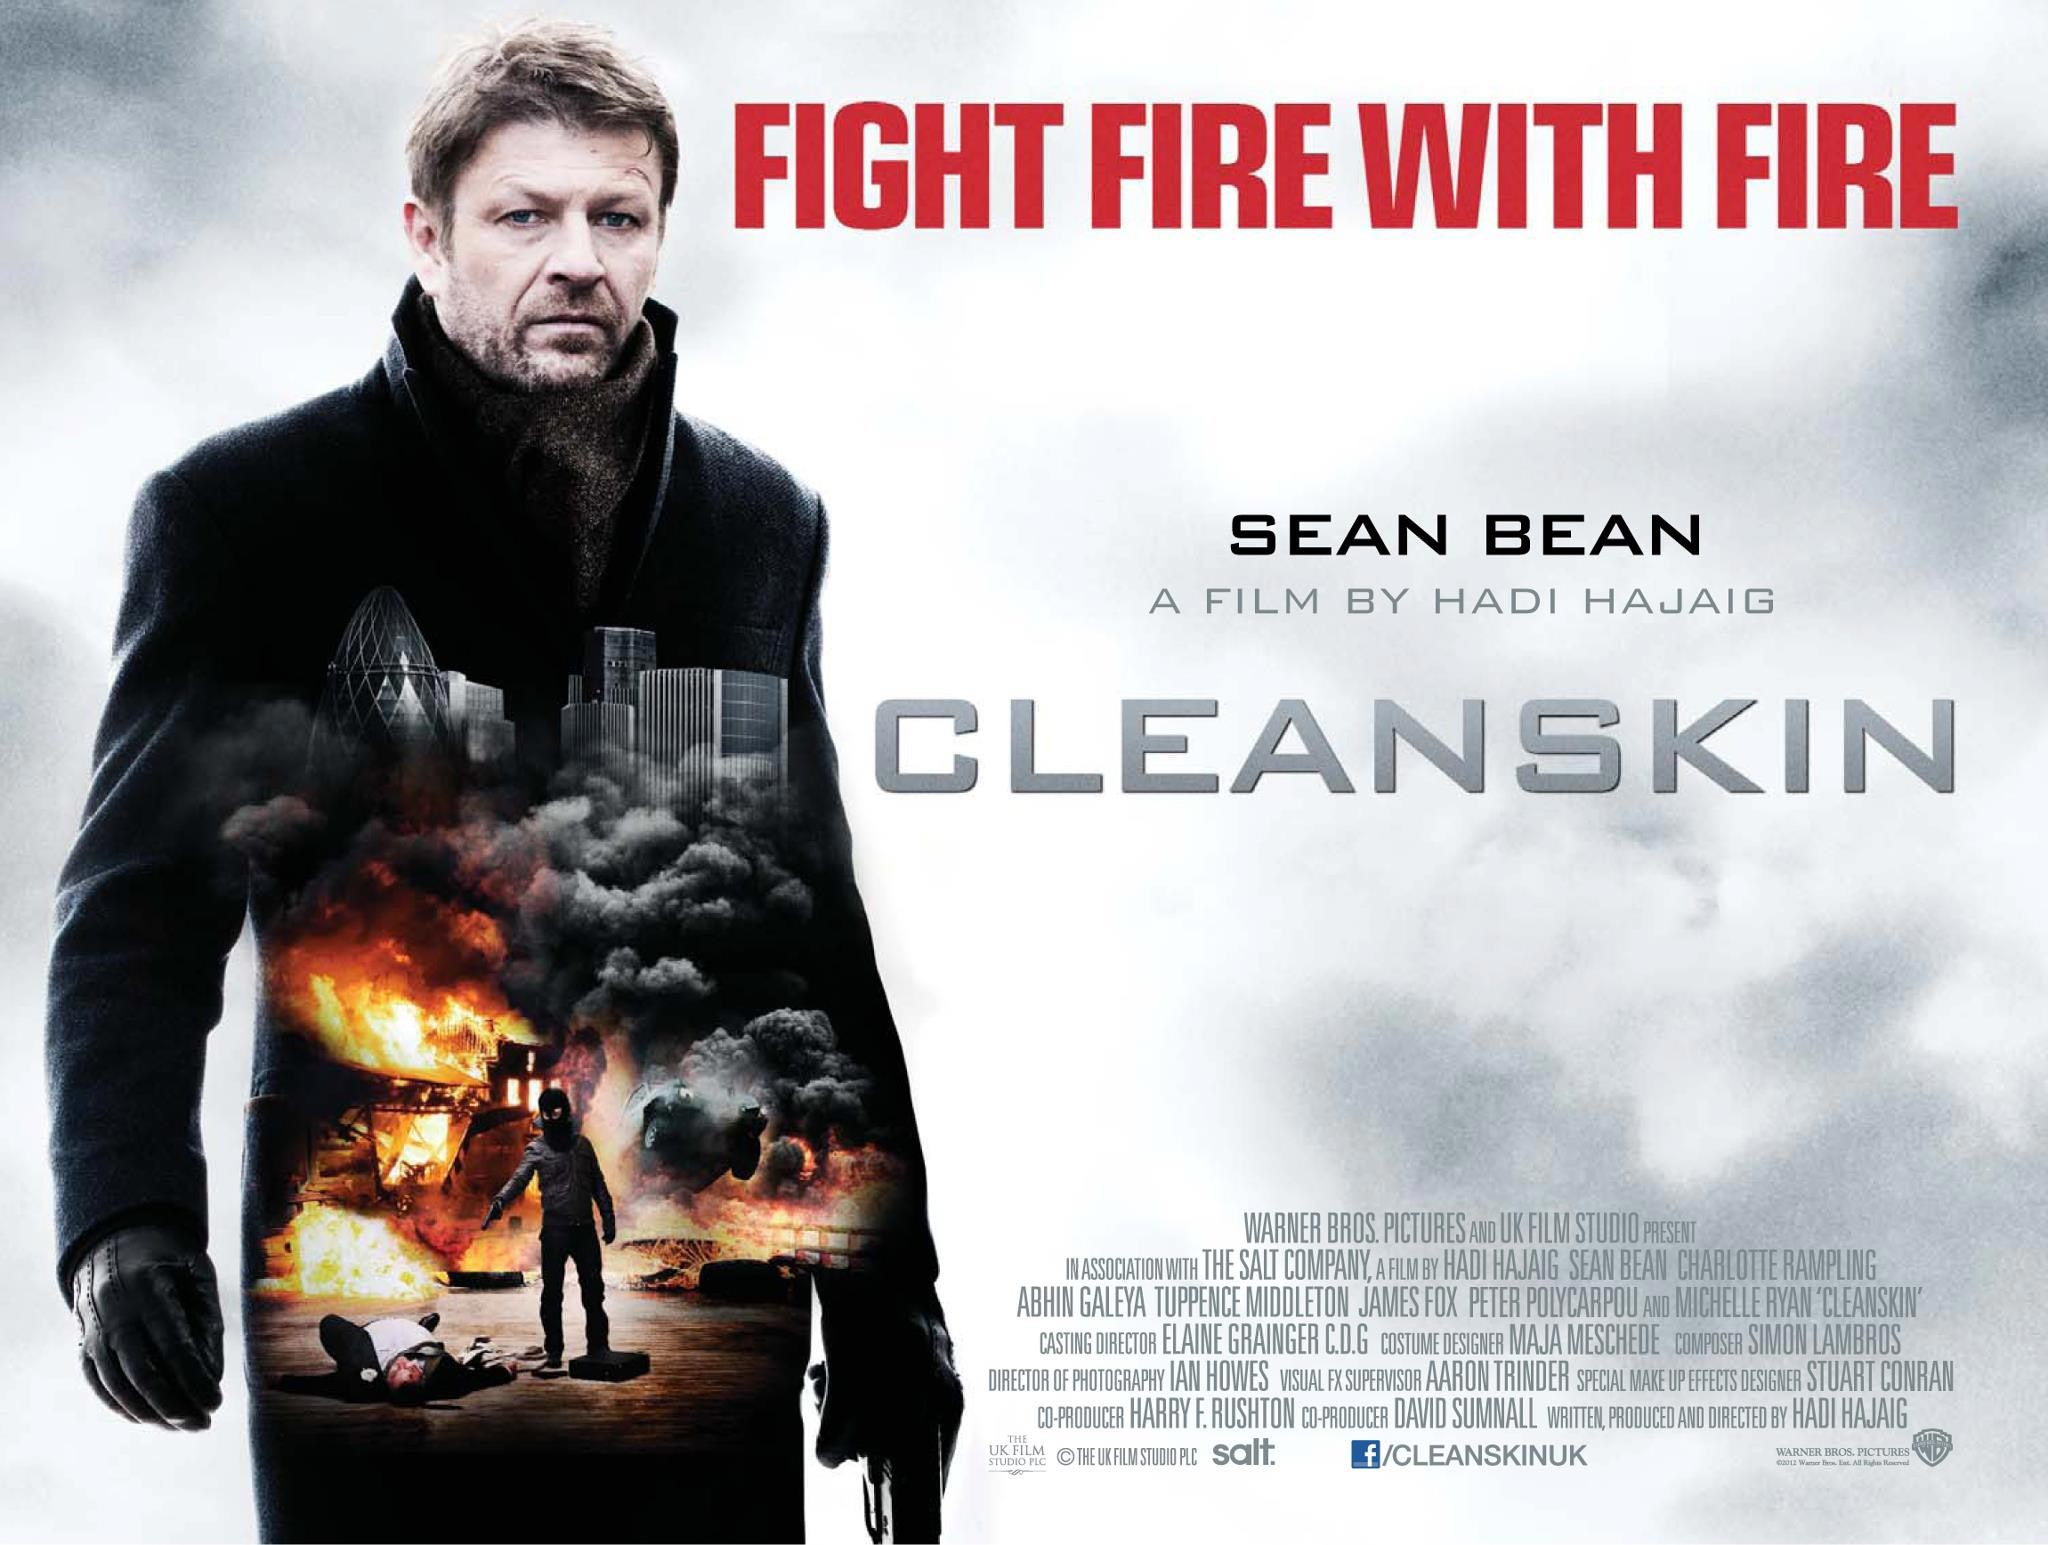 https://i1.wp.com/www.filmofilia.com/wp-content/uploads/2012/03/cleanskin_quad.jpg